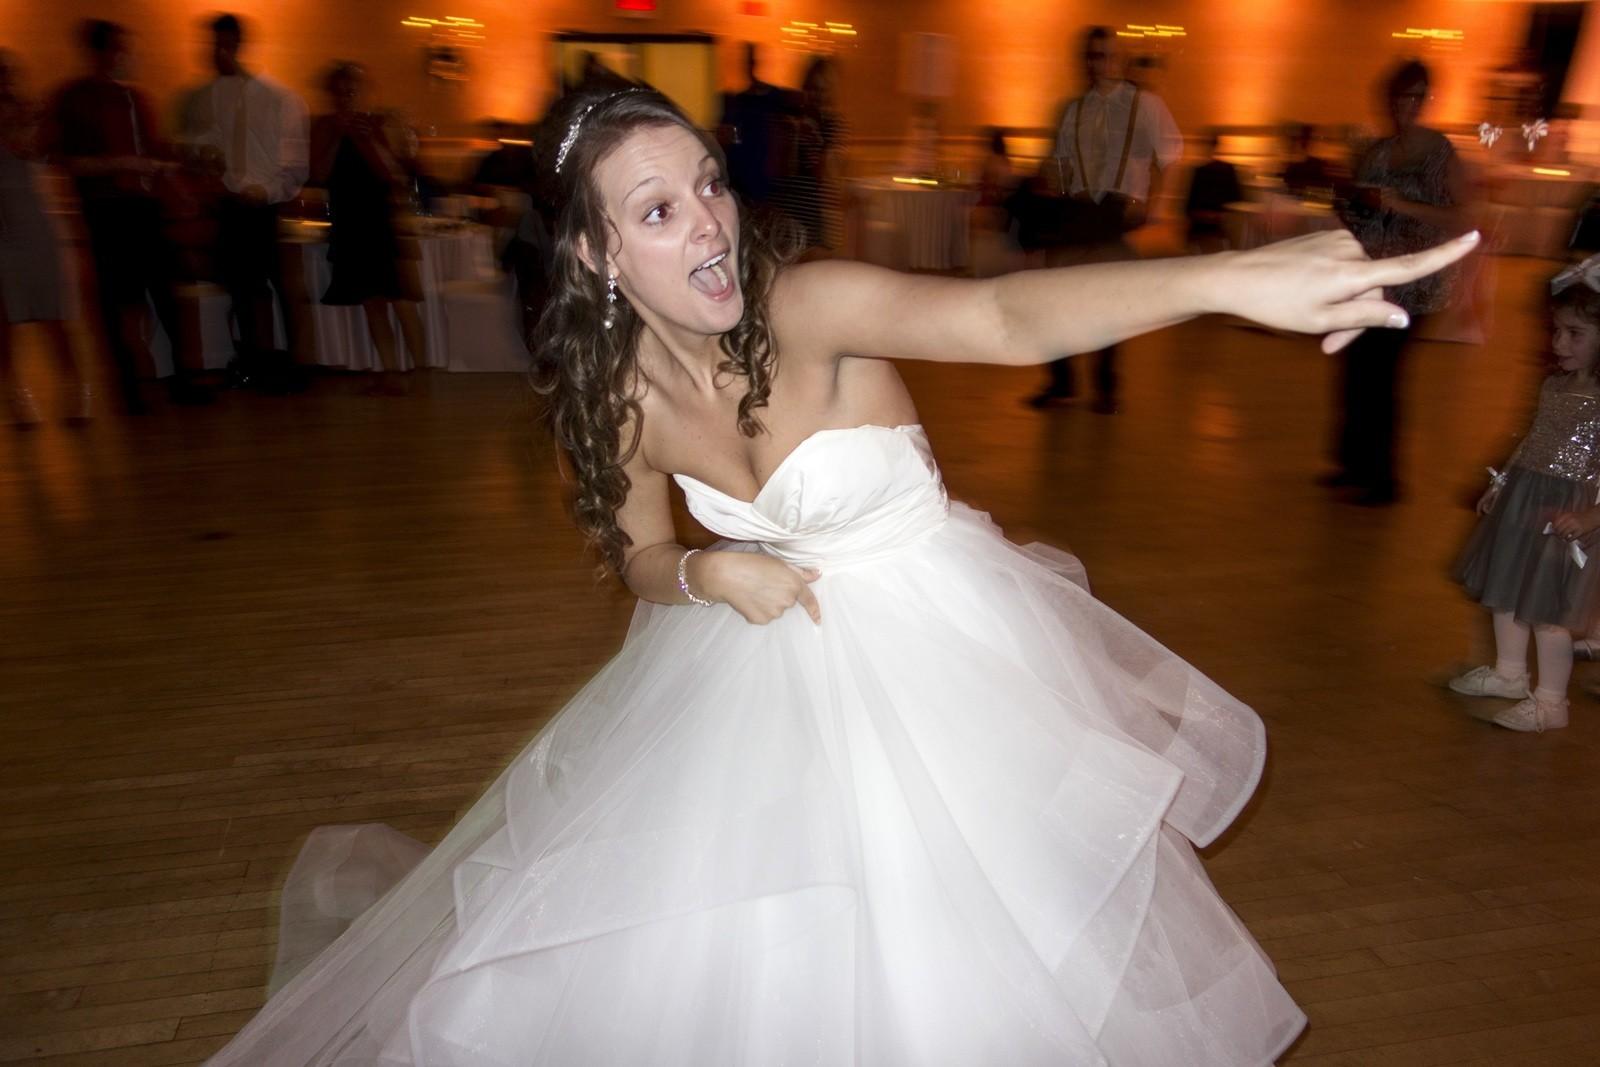 dancing-queen-bride-copyright-2014-daniel-d-teoli-jr-mr.jpg